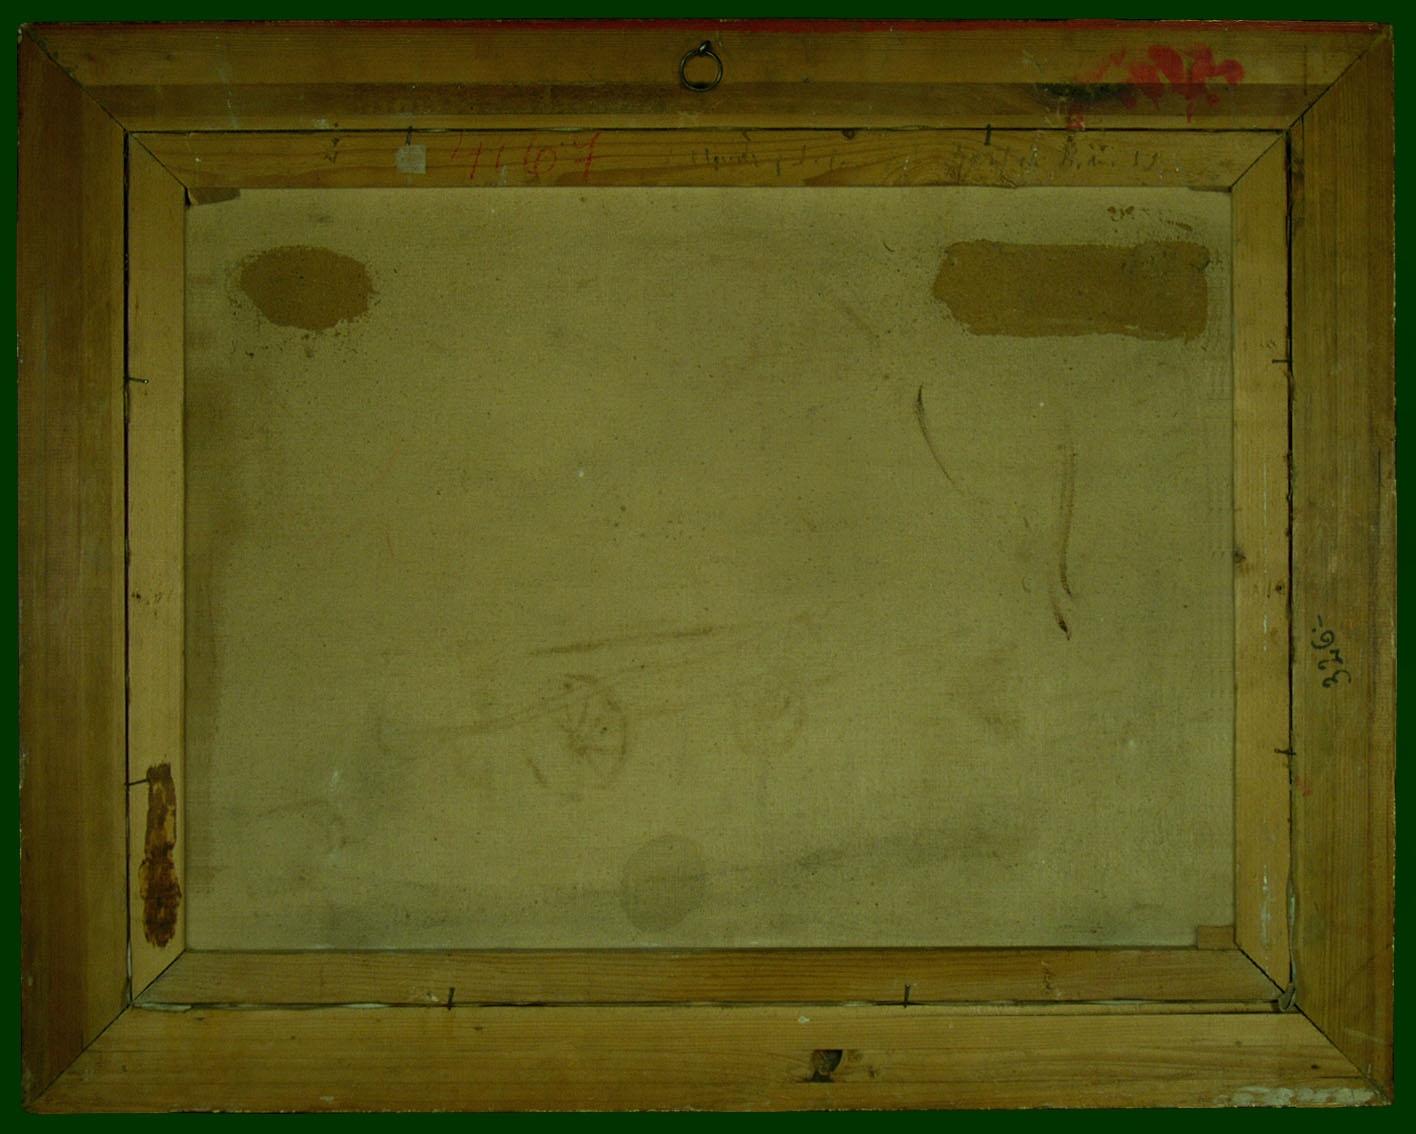 30-14hat.JPG (1416×1134)